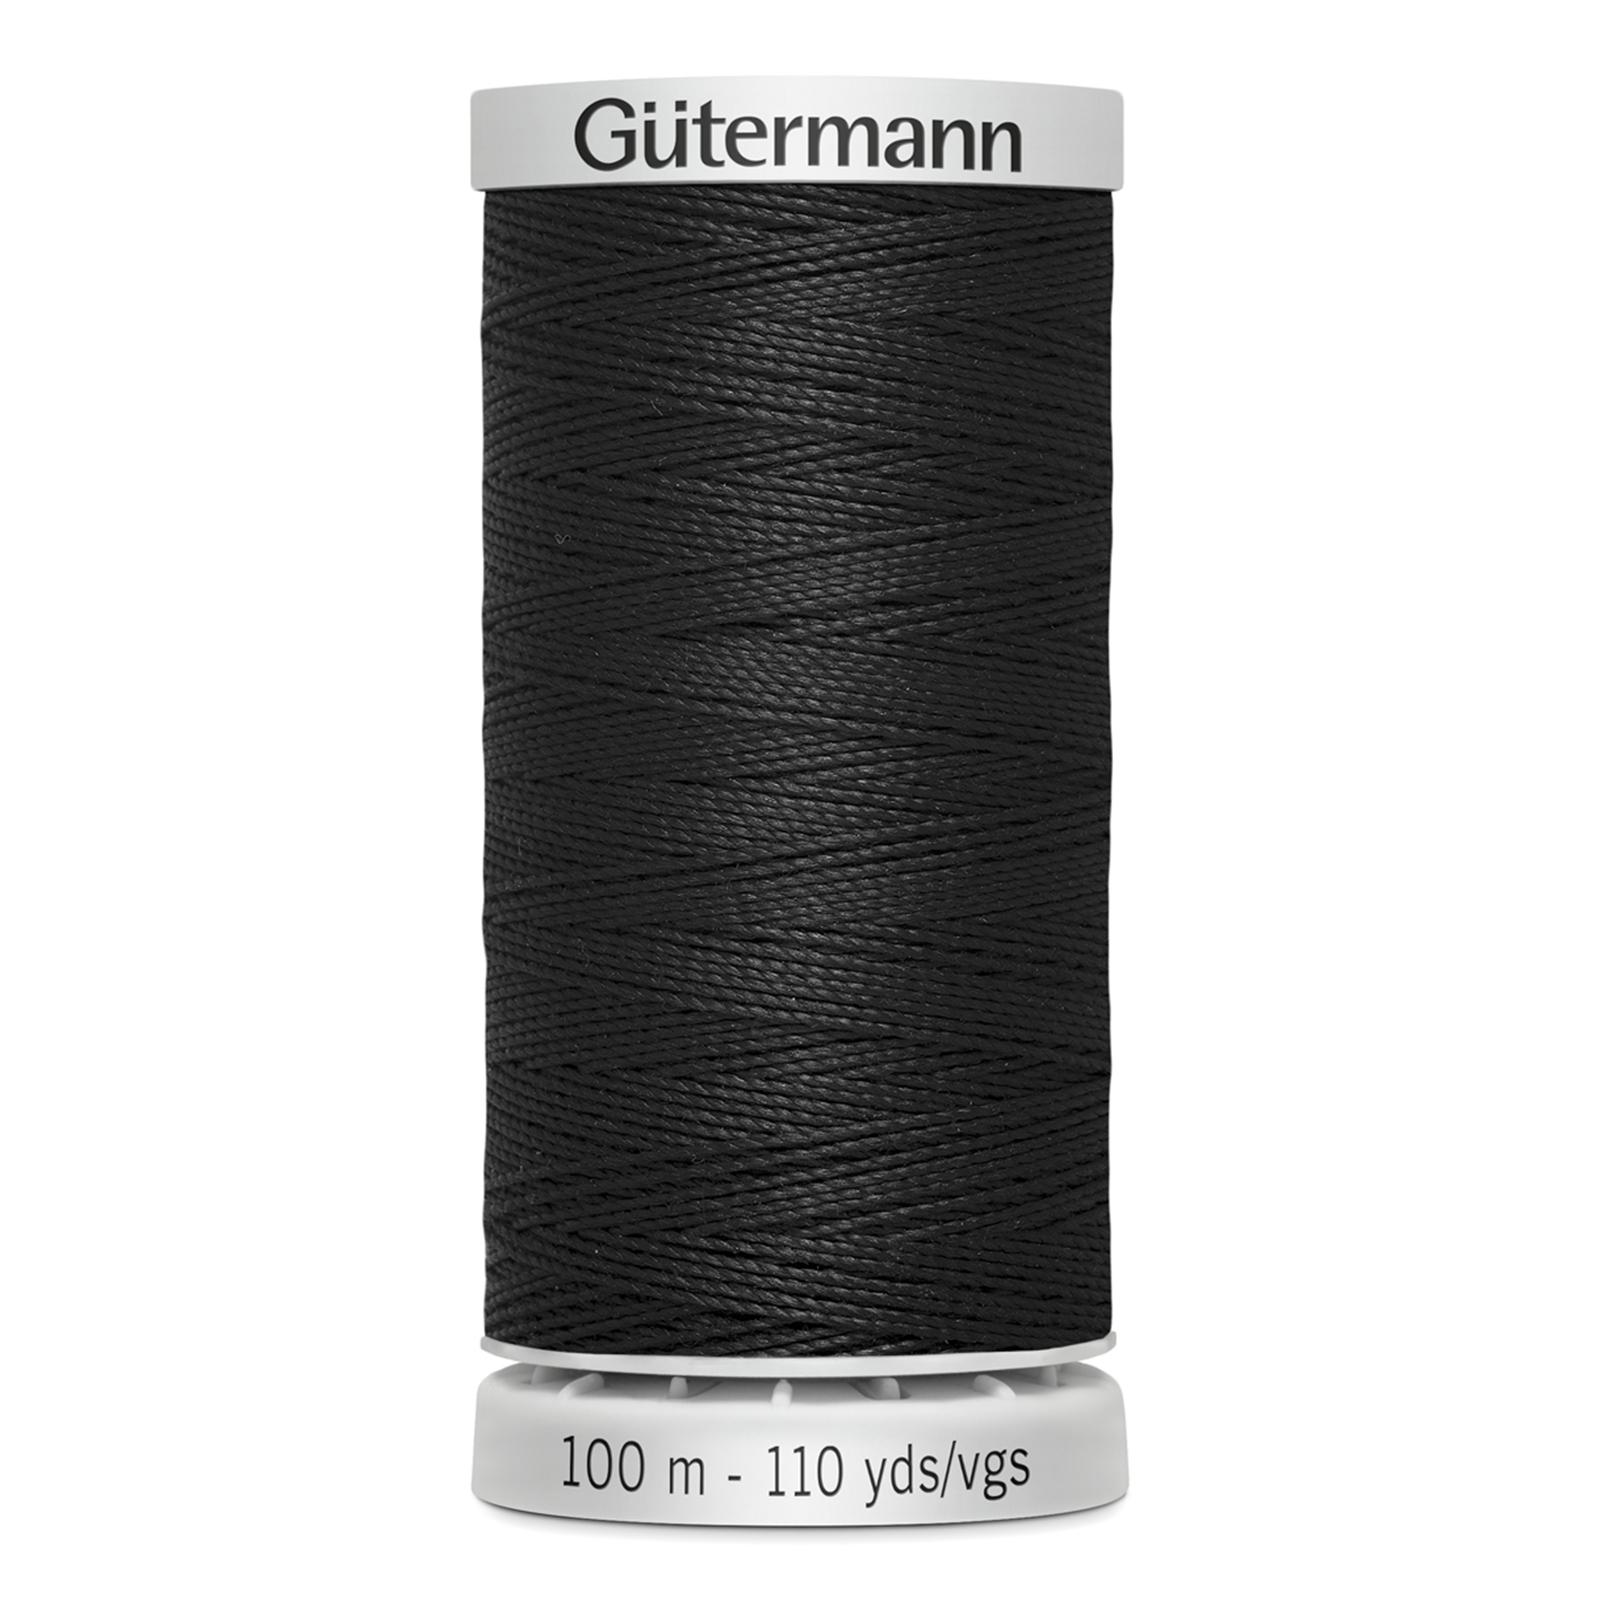 Gutermann Super St. 100m-000